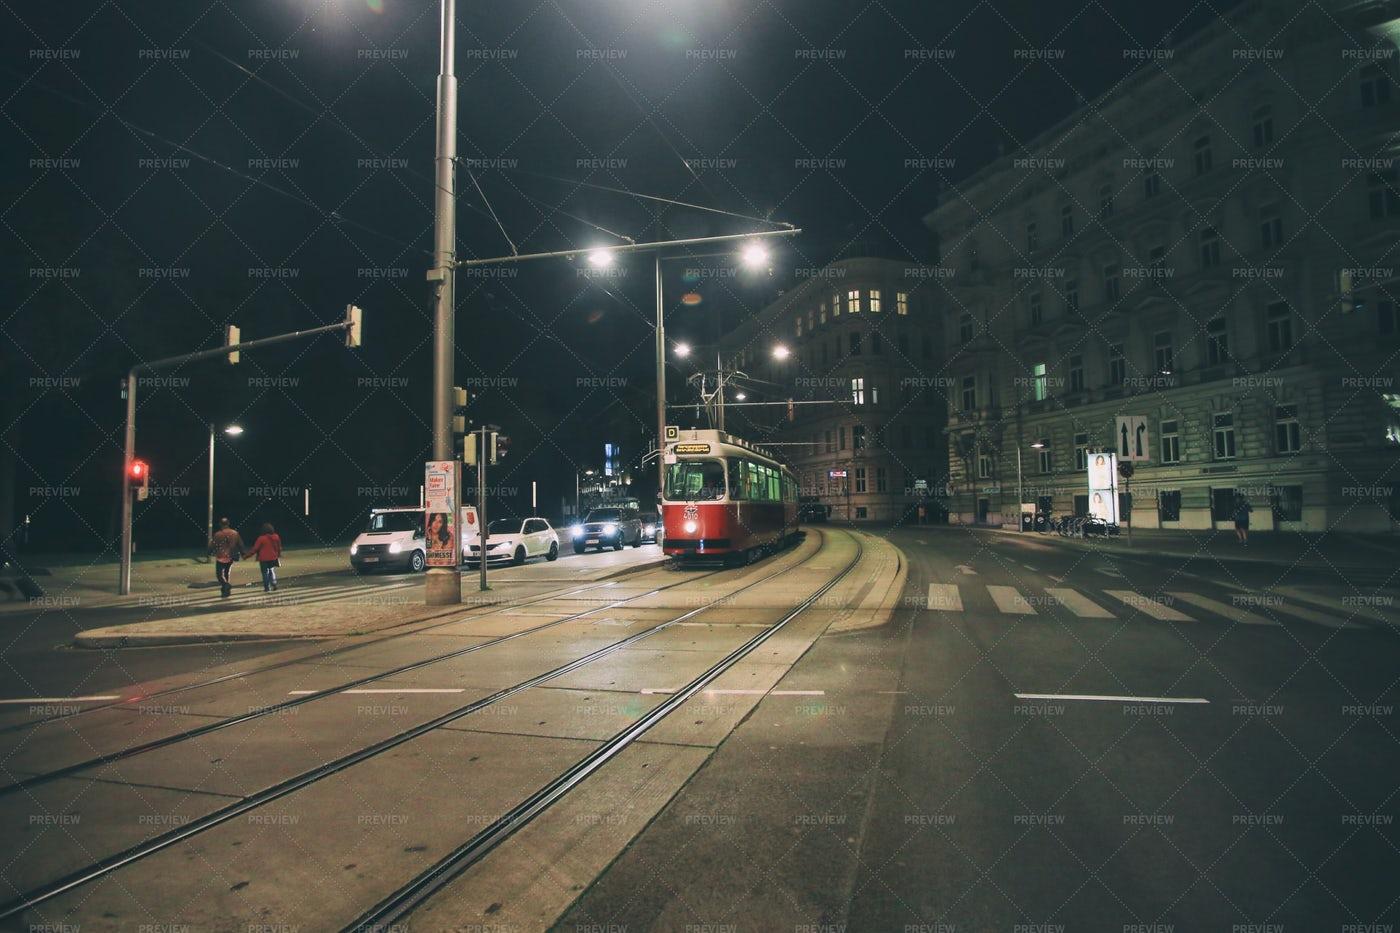 Night Tram In Vienna: Stock Photos